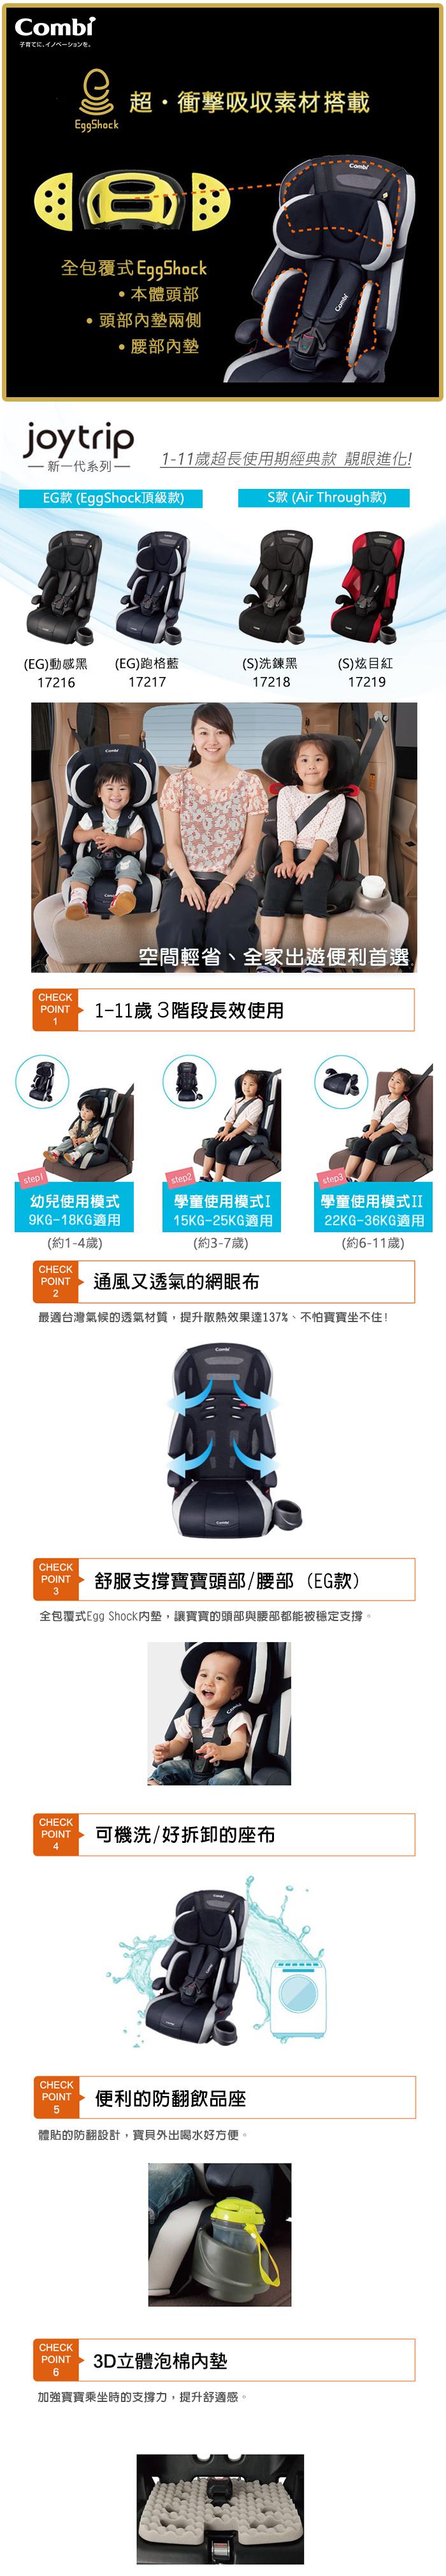 Combi Joytrip 2018 MC (EG)汽車安全座椅